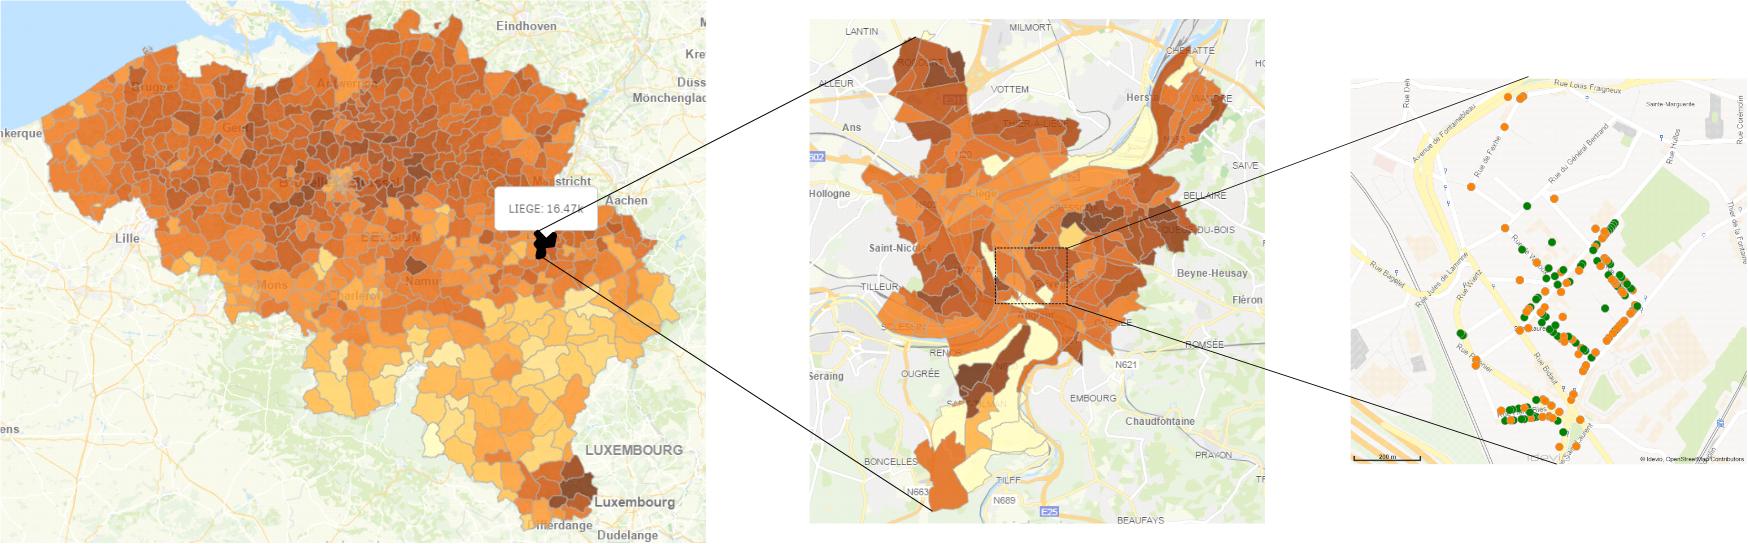 datavisualizationtips_belgium.png